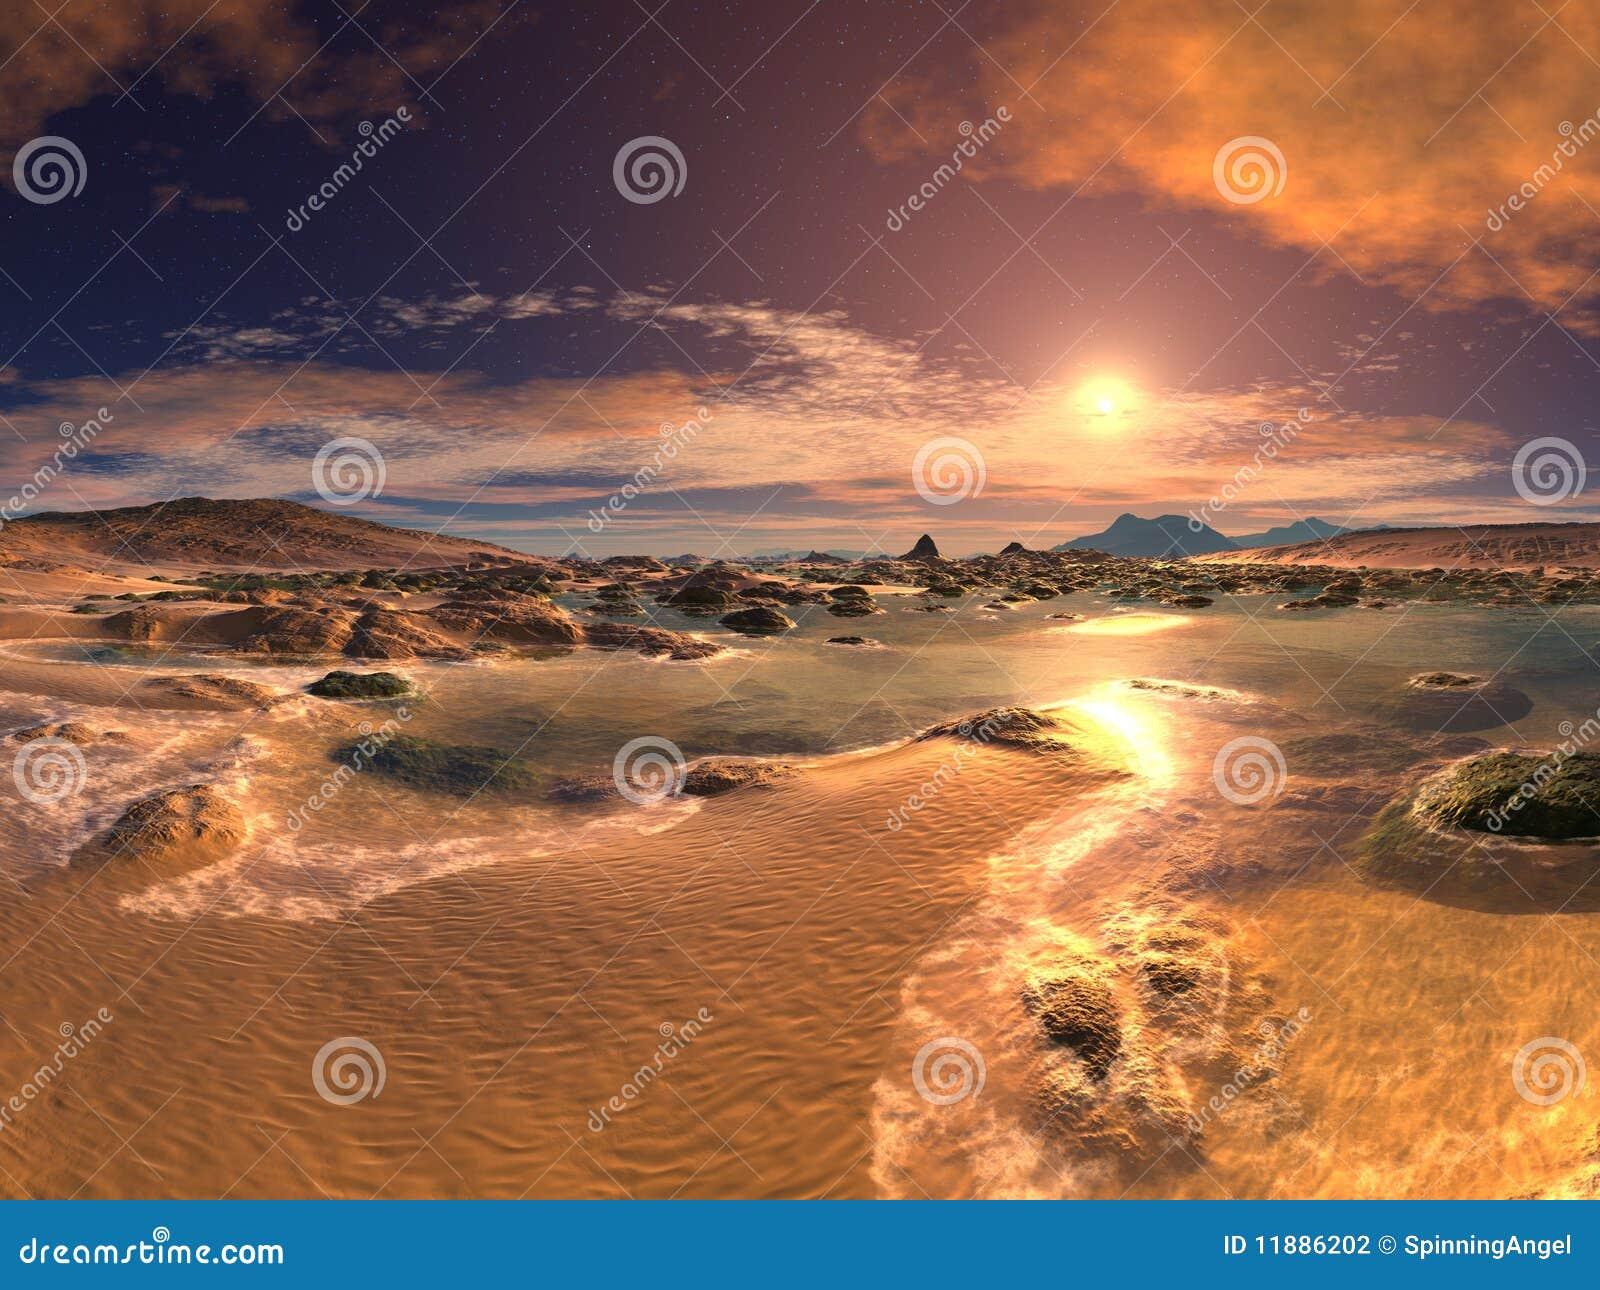 Sunrise/Sunset Beach